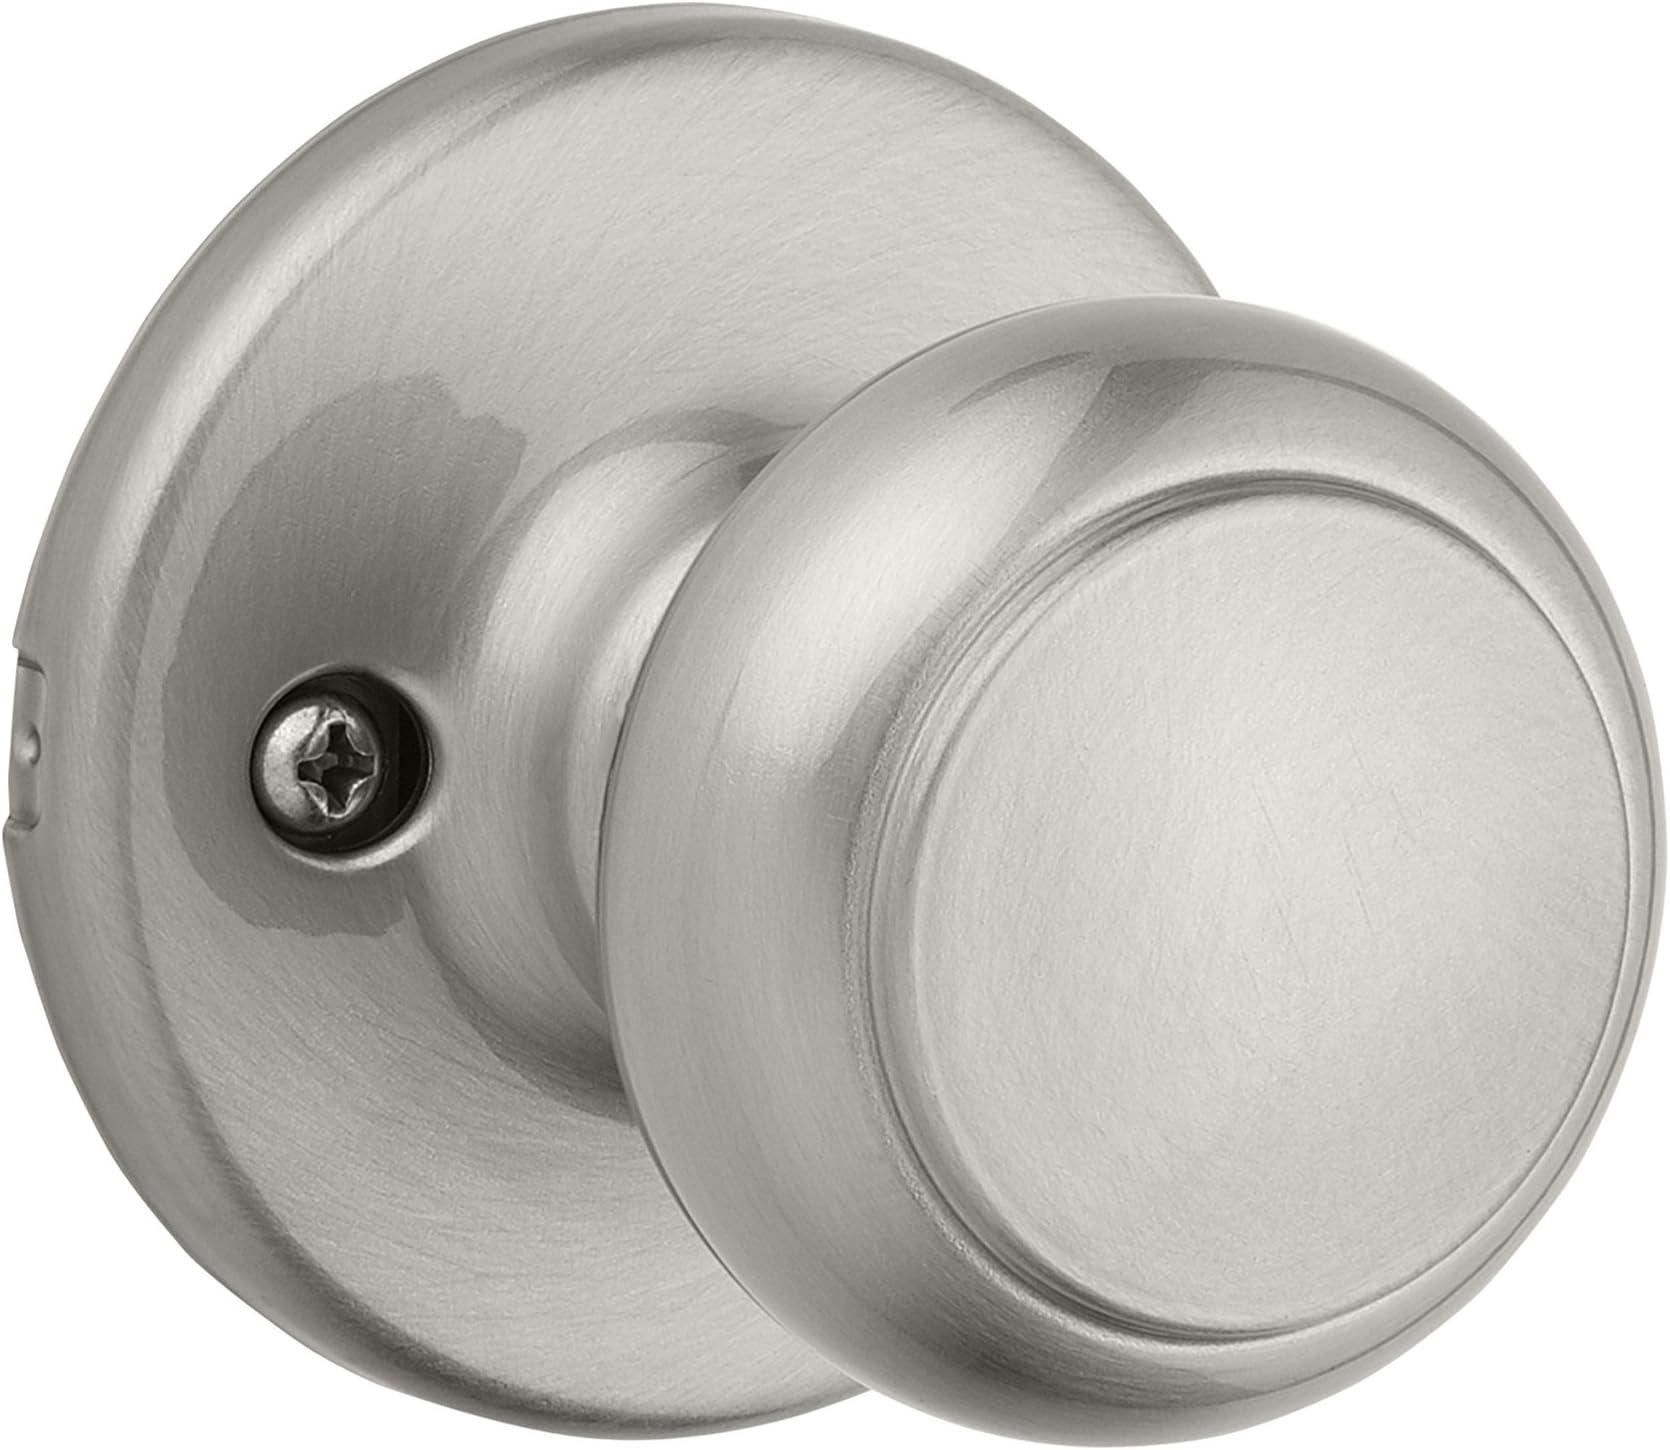 Kwikset 94880-584 Cove Dummy Door Knob in Polished Chrome